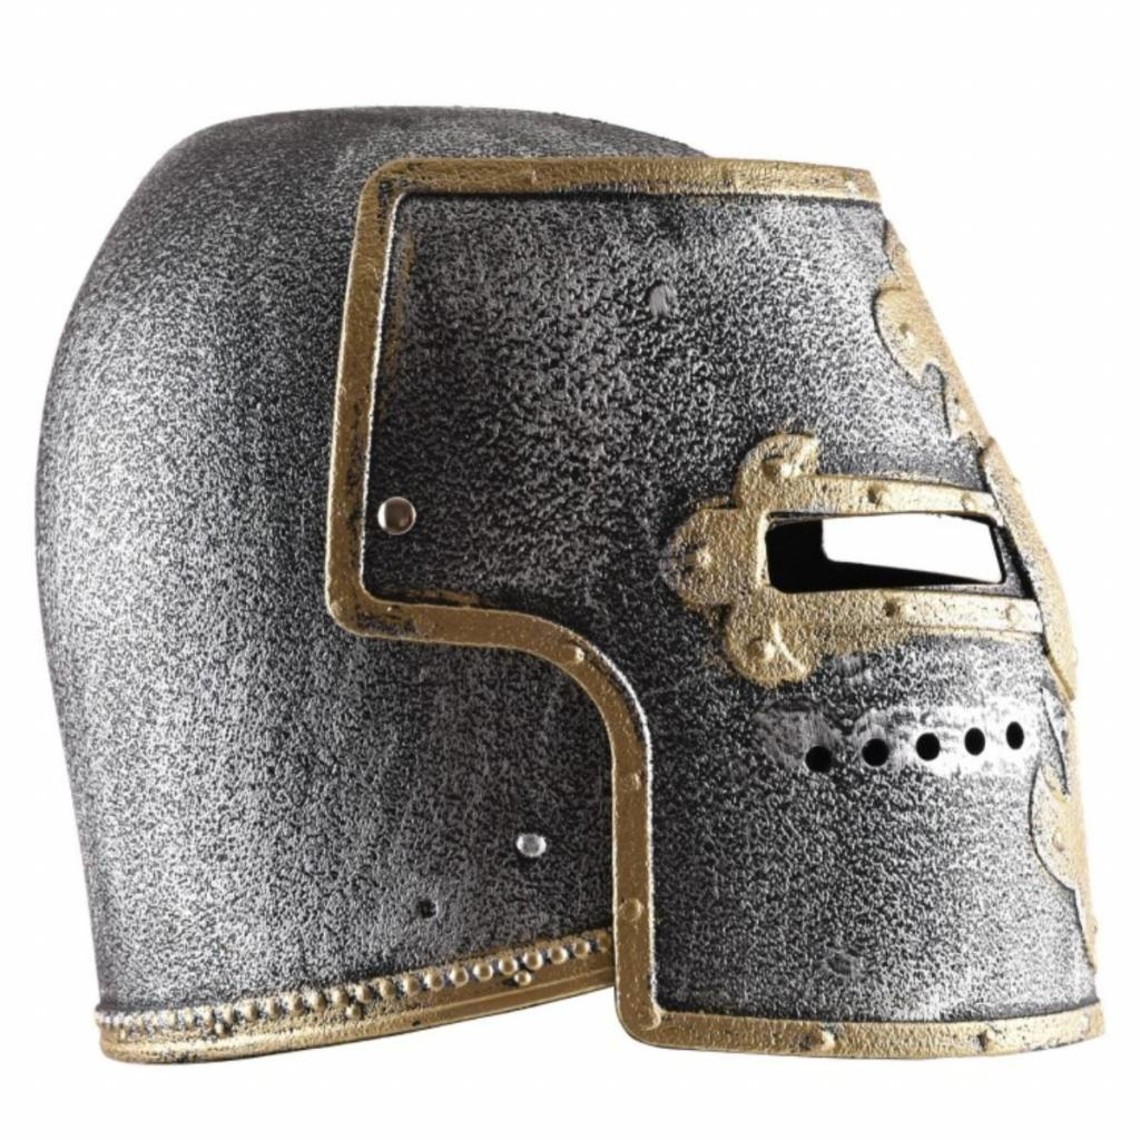 Speelgoed Grote Helm met vizier